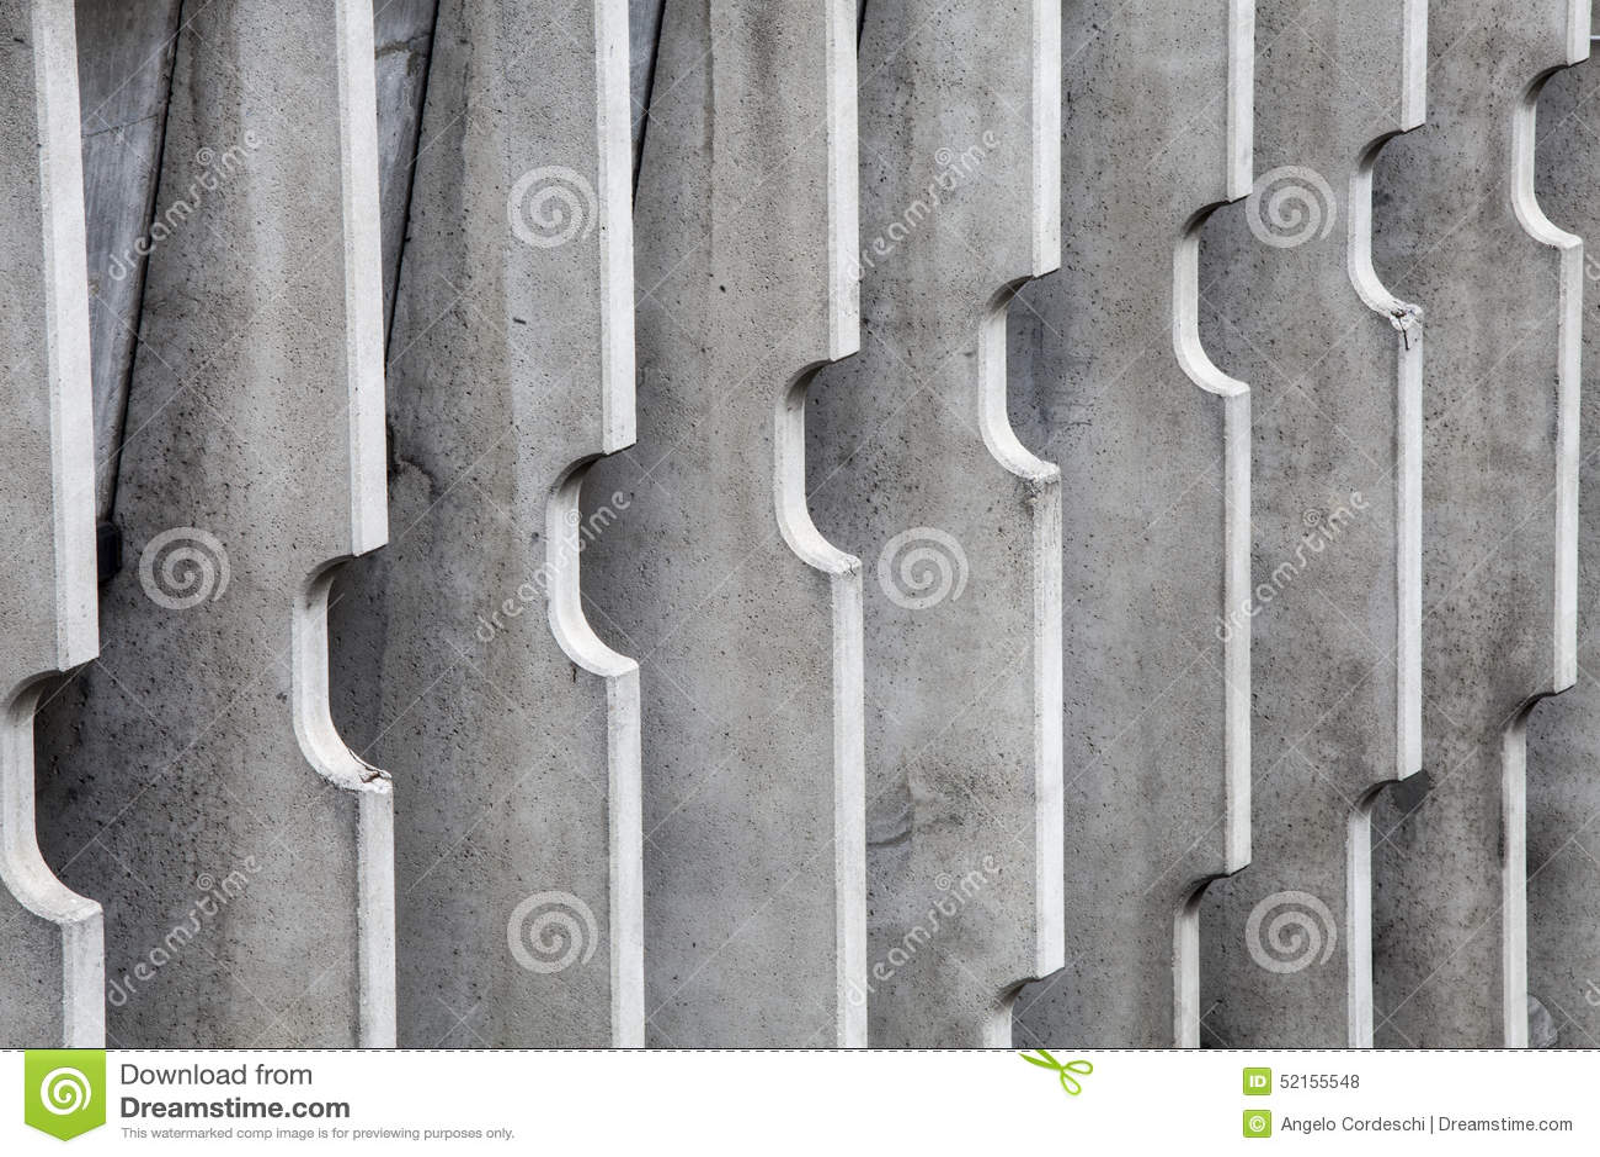 Divisores concretos Edificio moderno de las rayas verticales